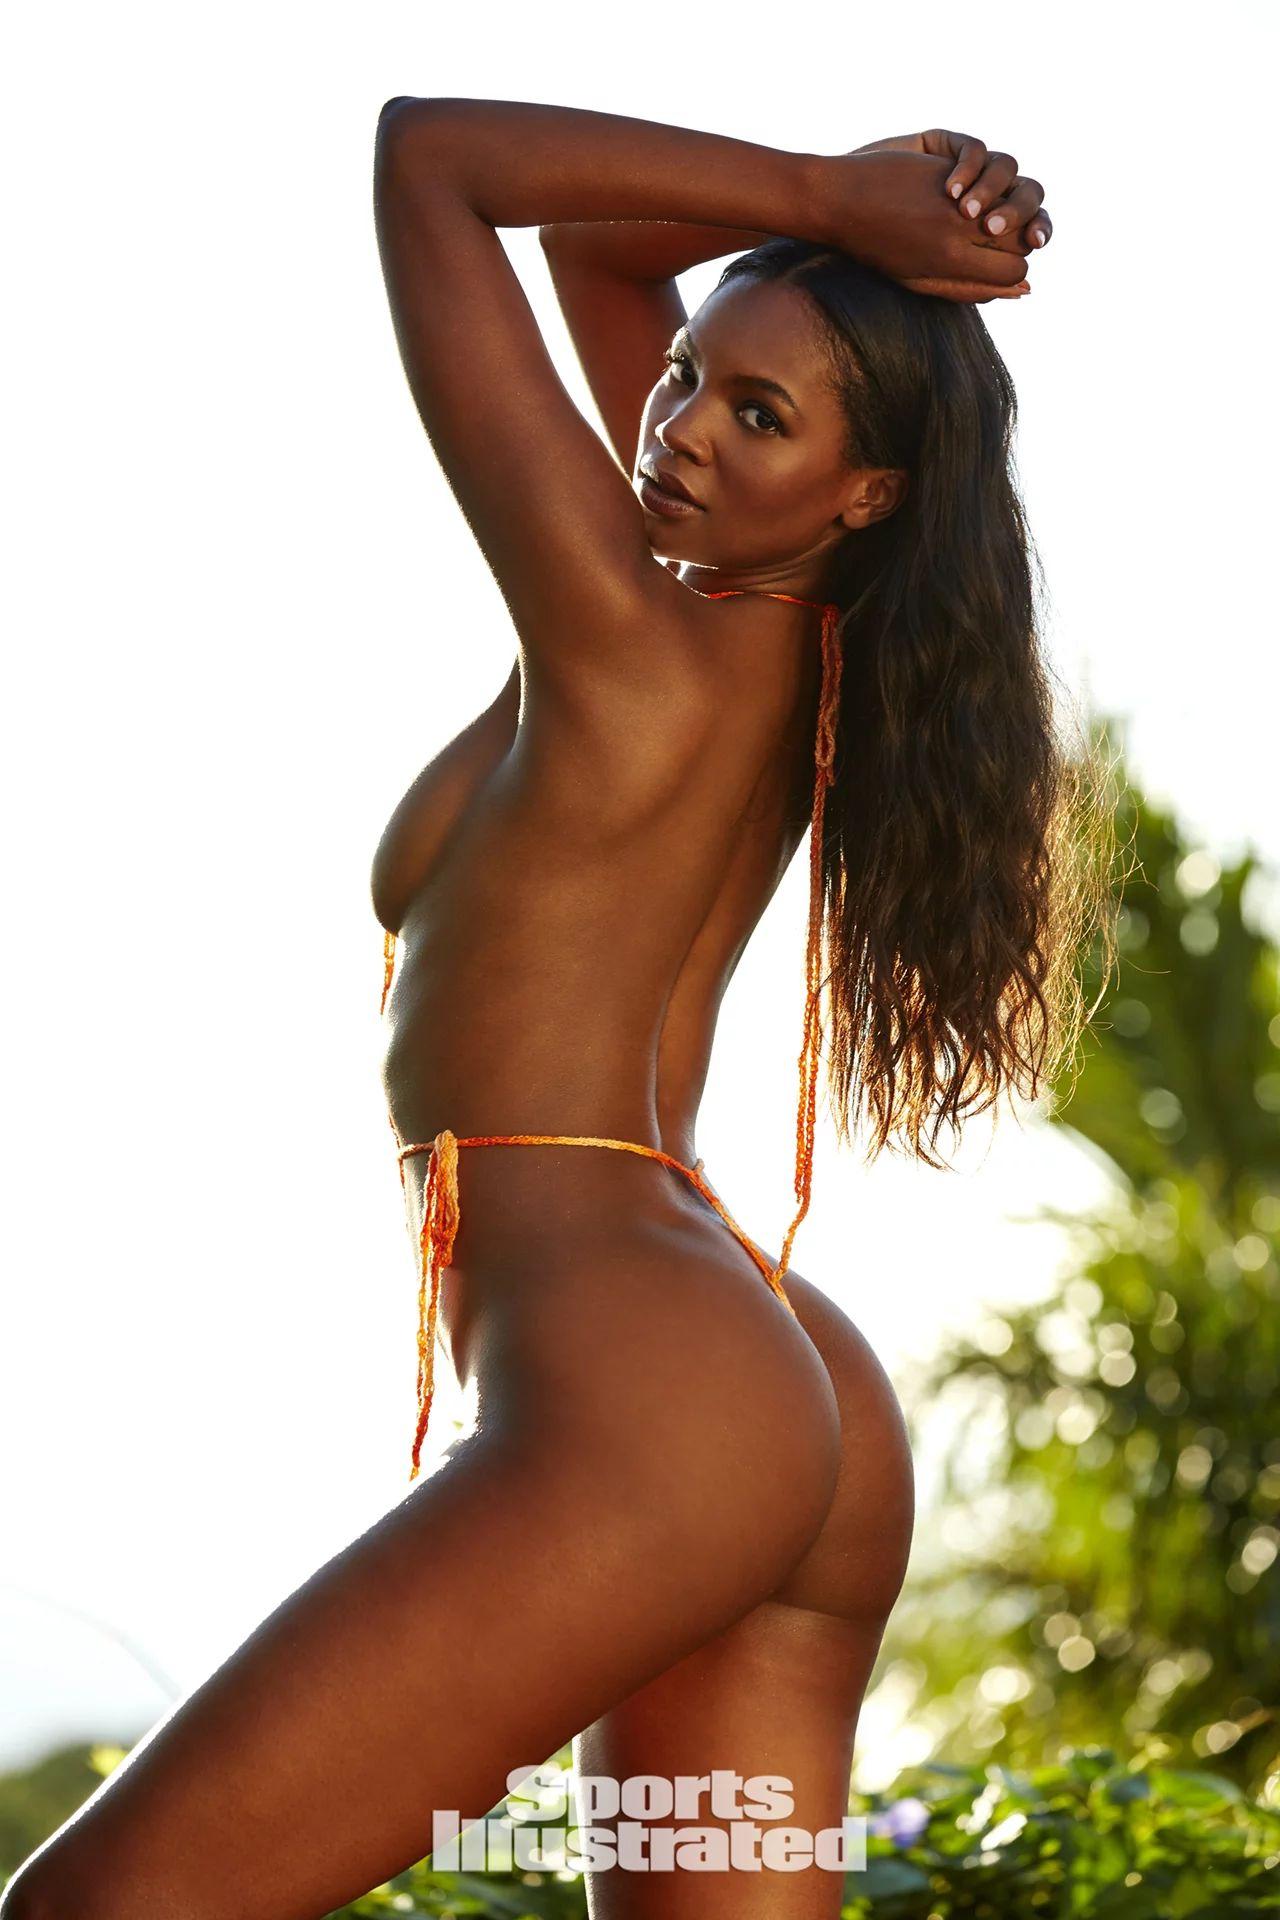 XXX Jasmyn Wilkins nude photos 2019